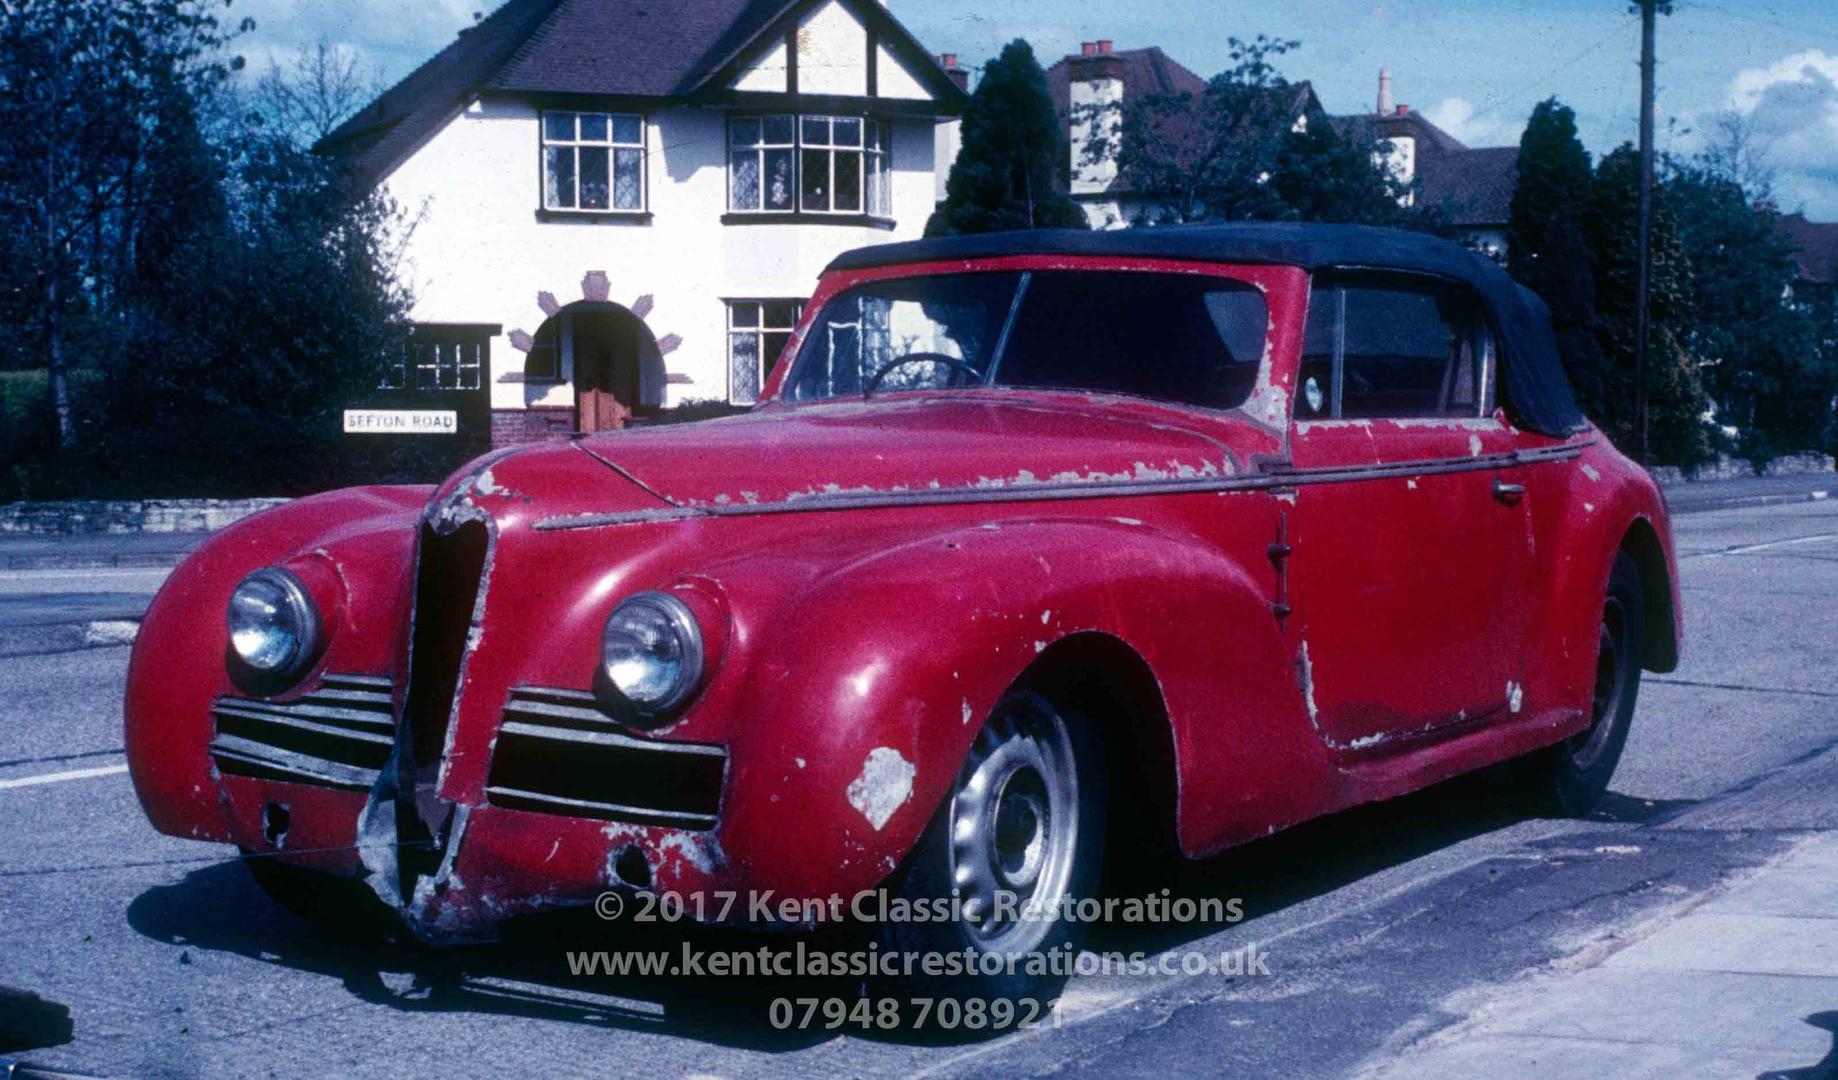 Car Restoration Fabrication Of Classic Vintage Cars Alfa Romeo Gt 1300 Junior Windscreen Wiper Motor